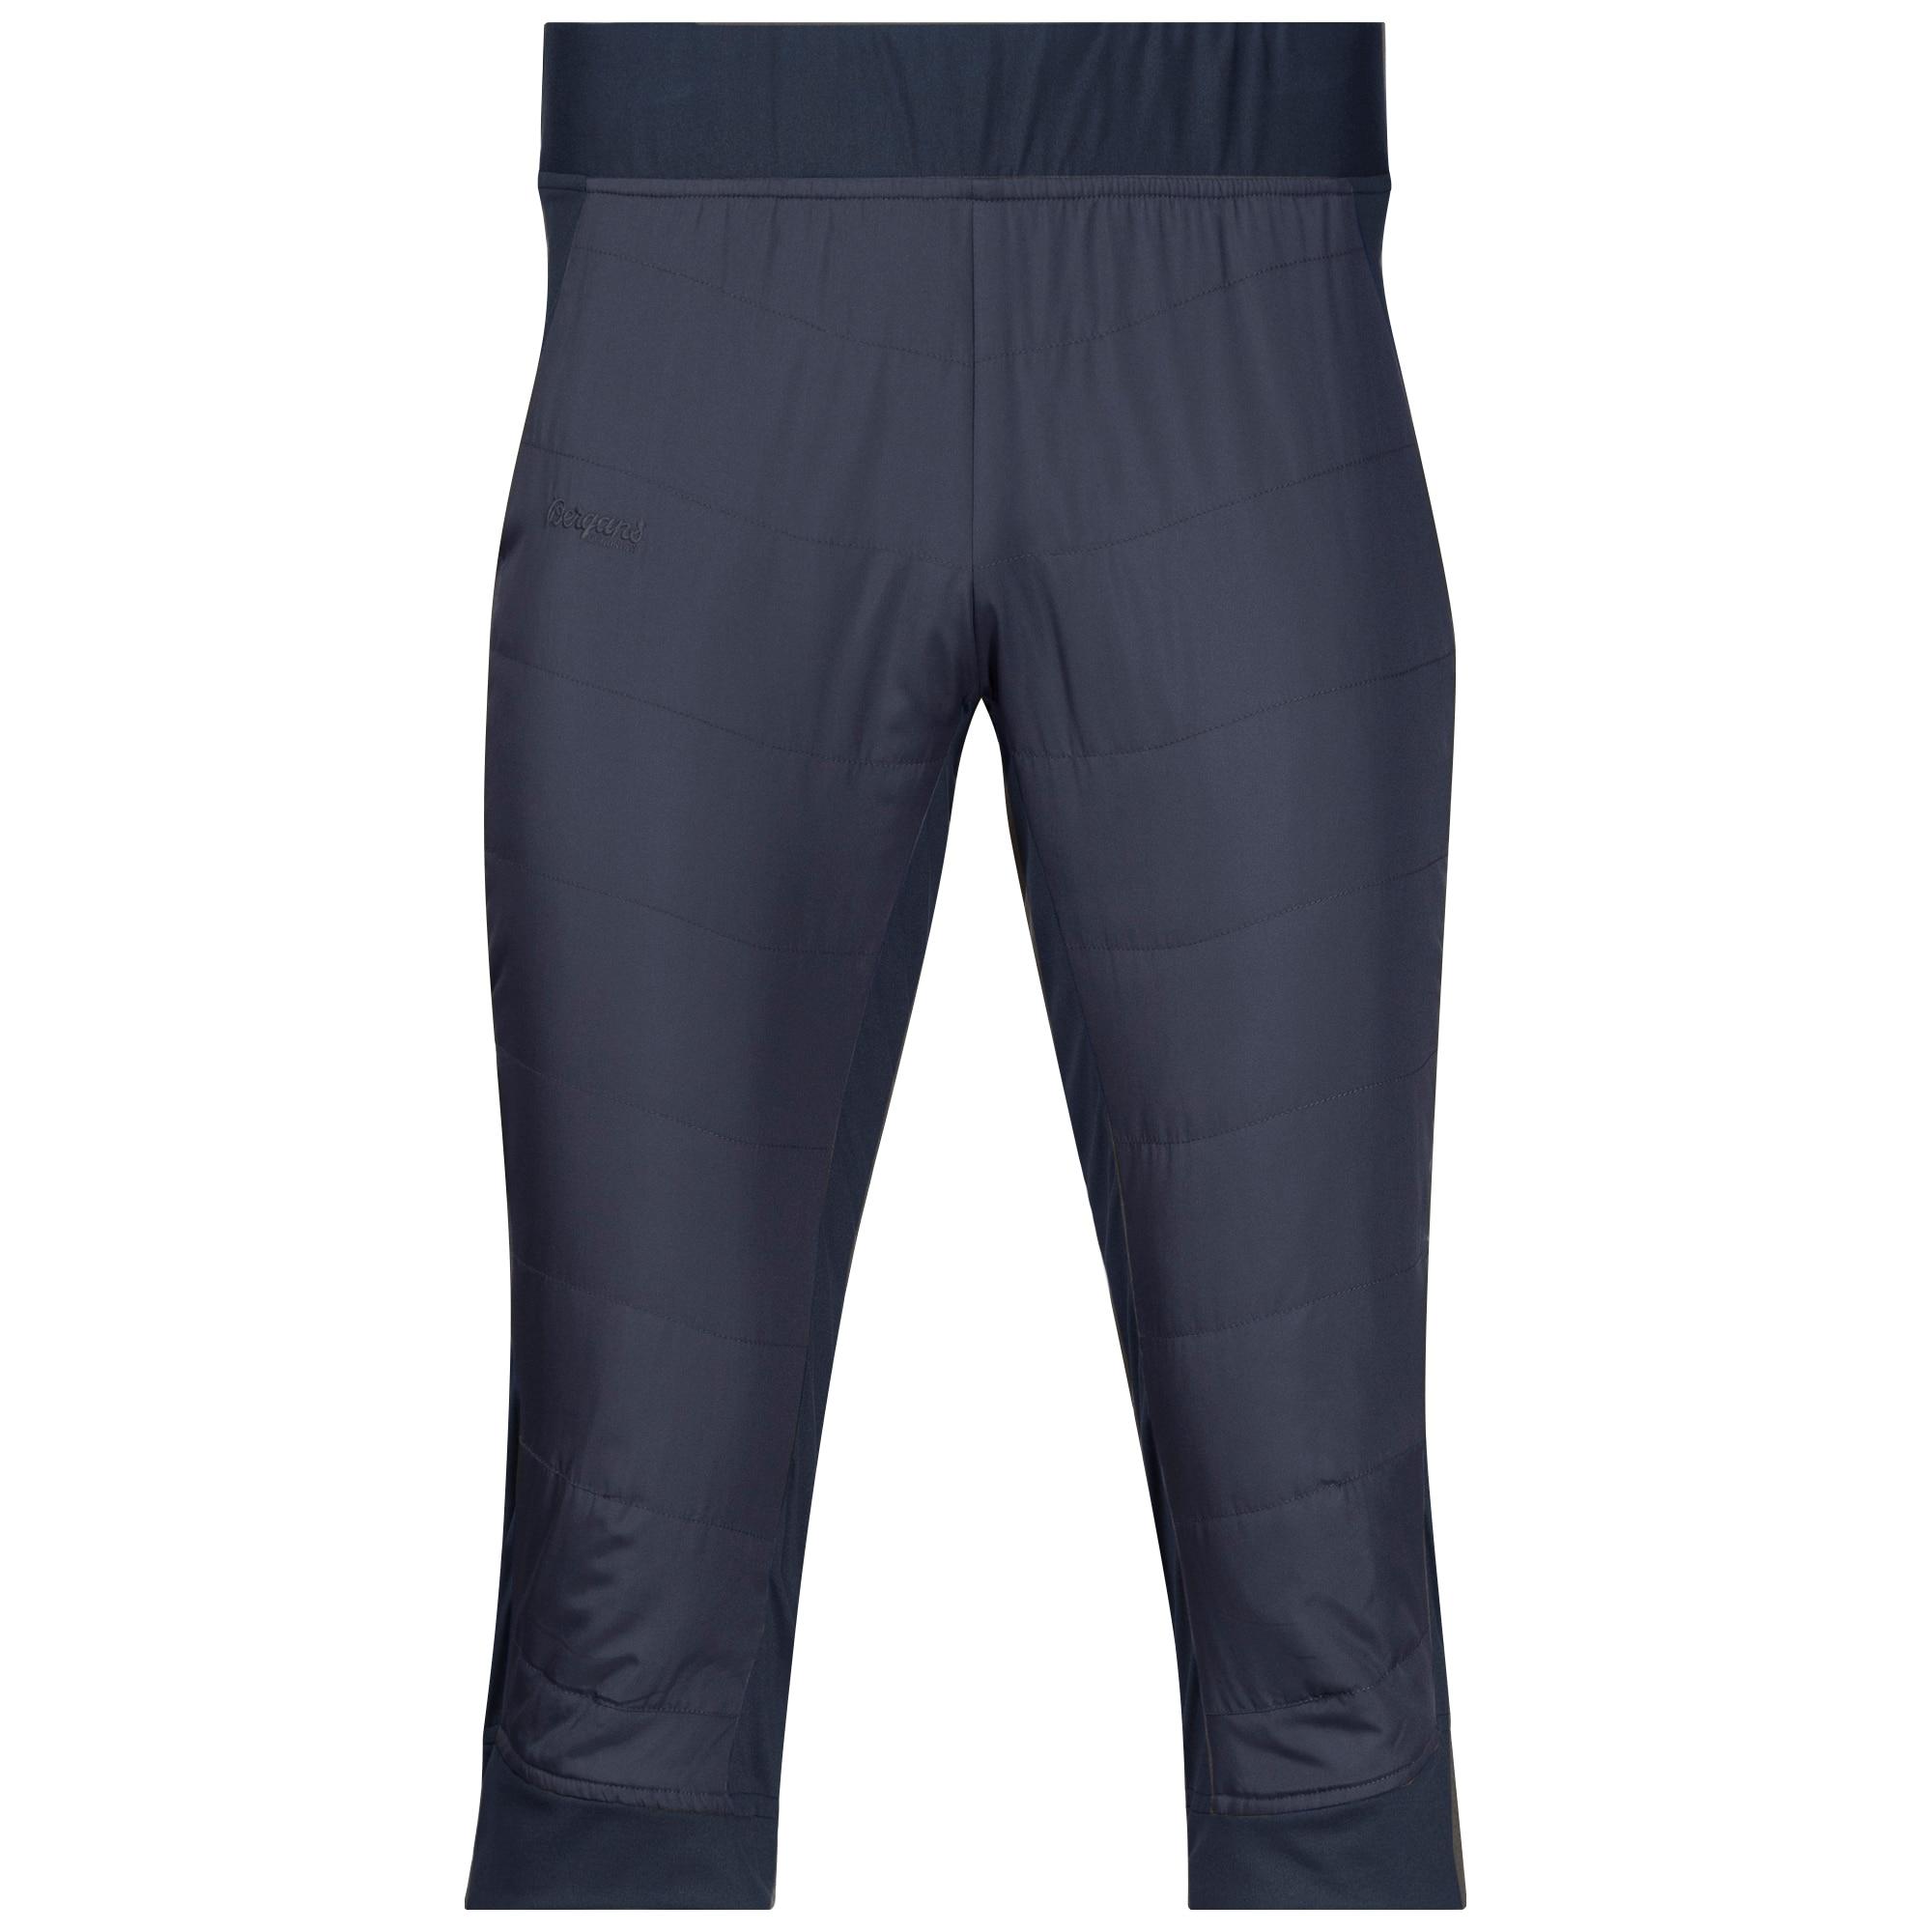 Stranda Hybrid 3/4 Pants